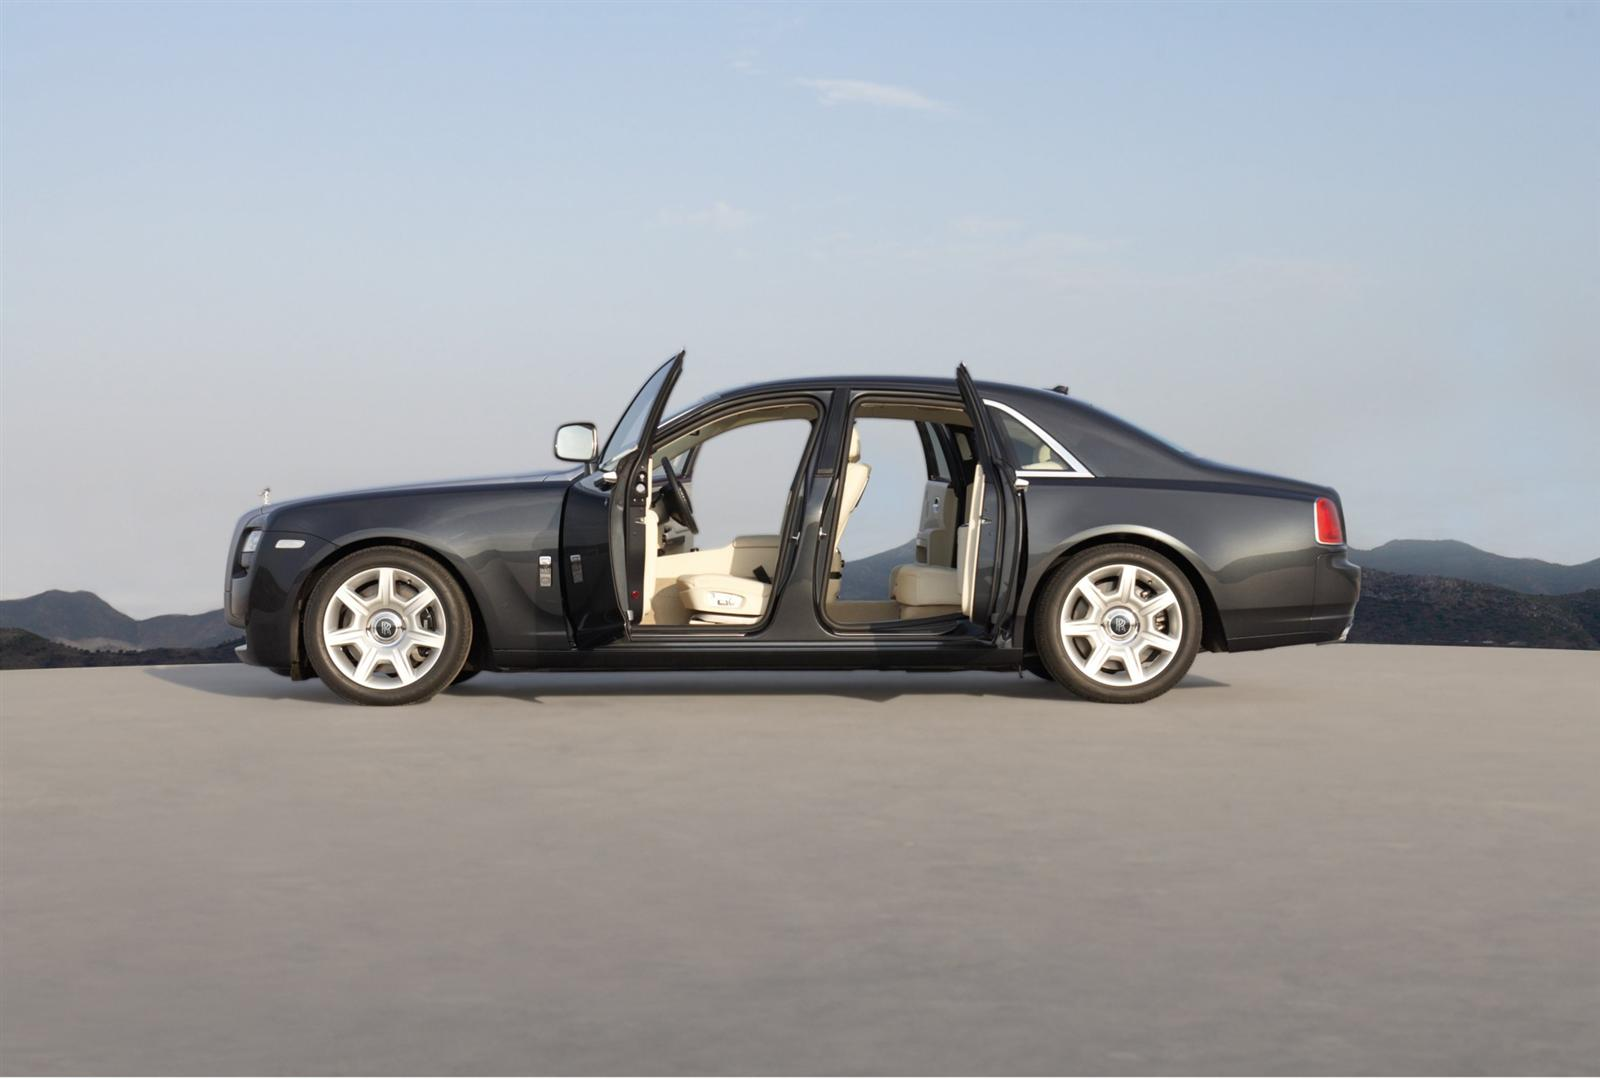 2010 Rolls-Royce Ghost Image